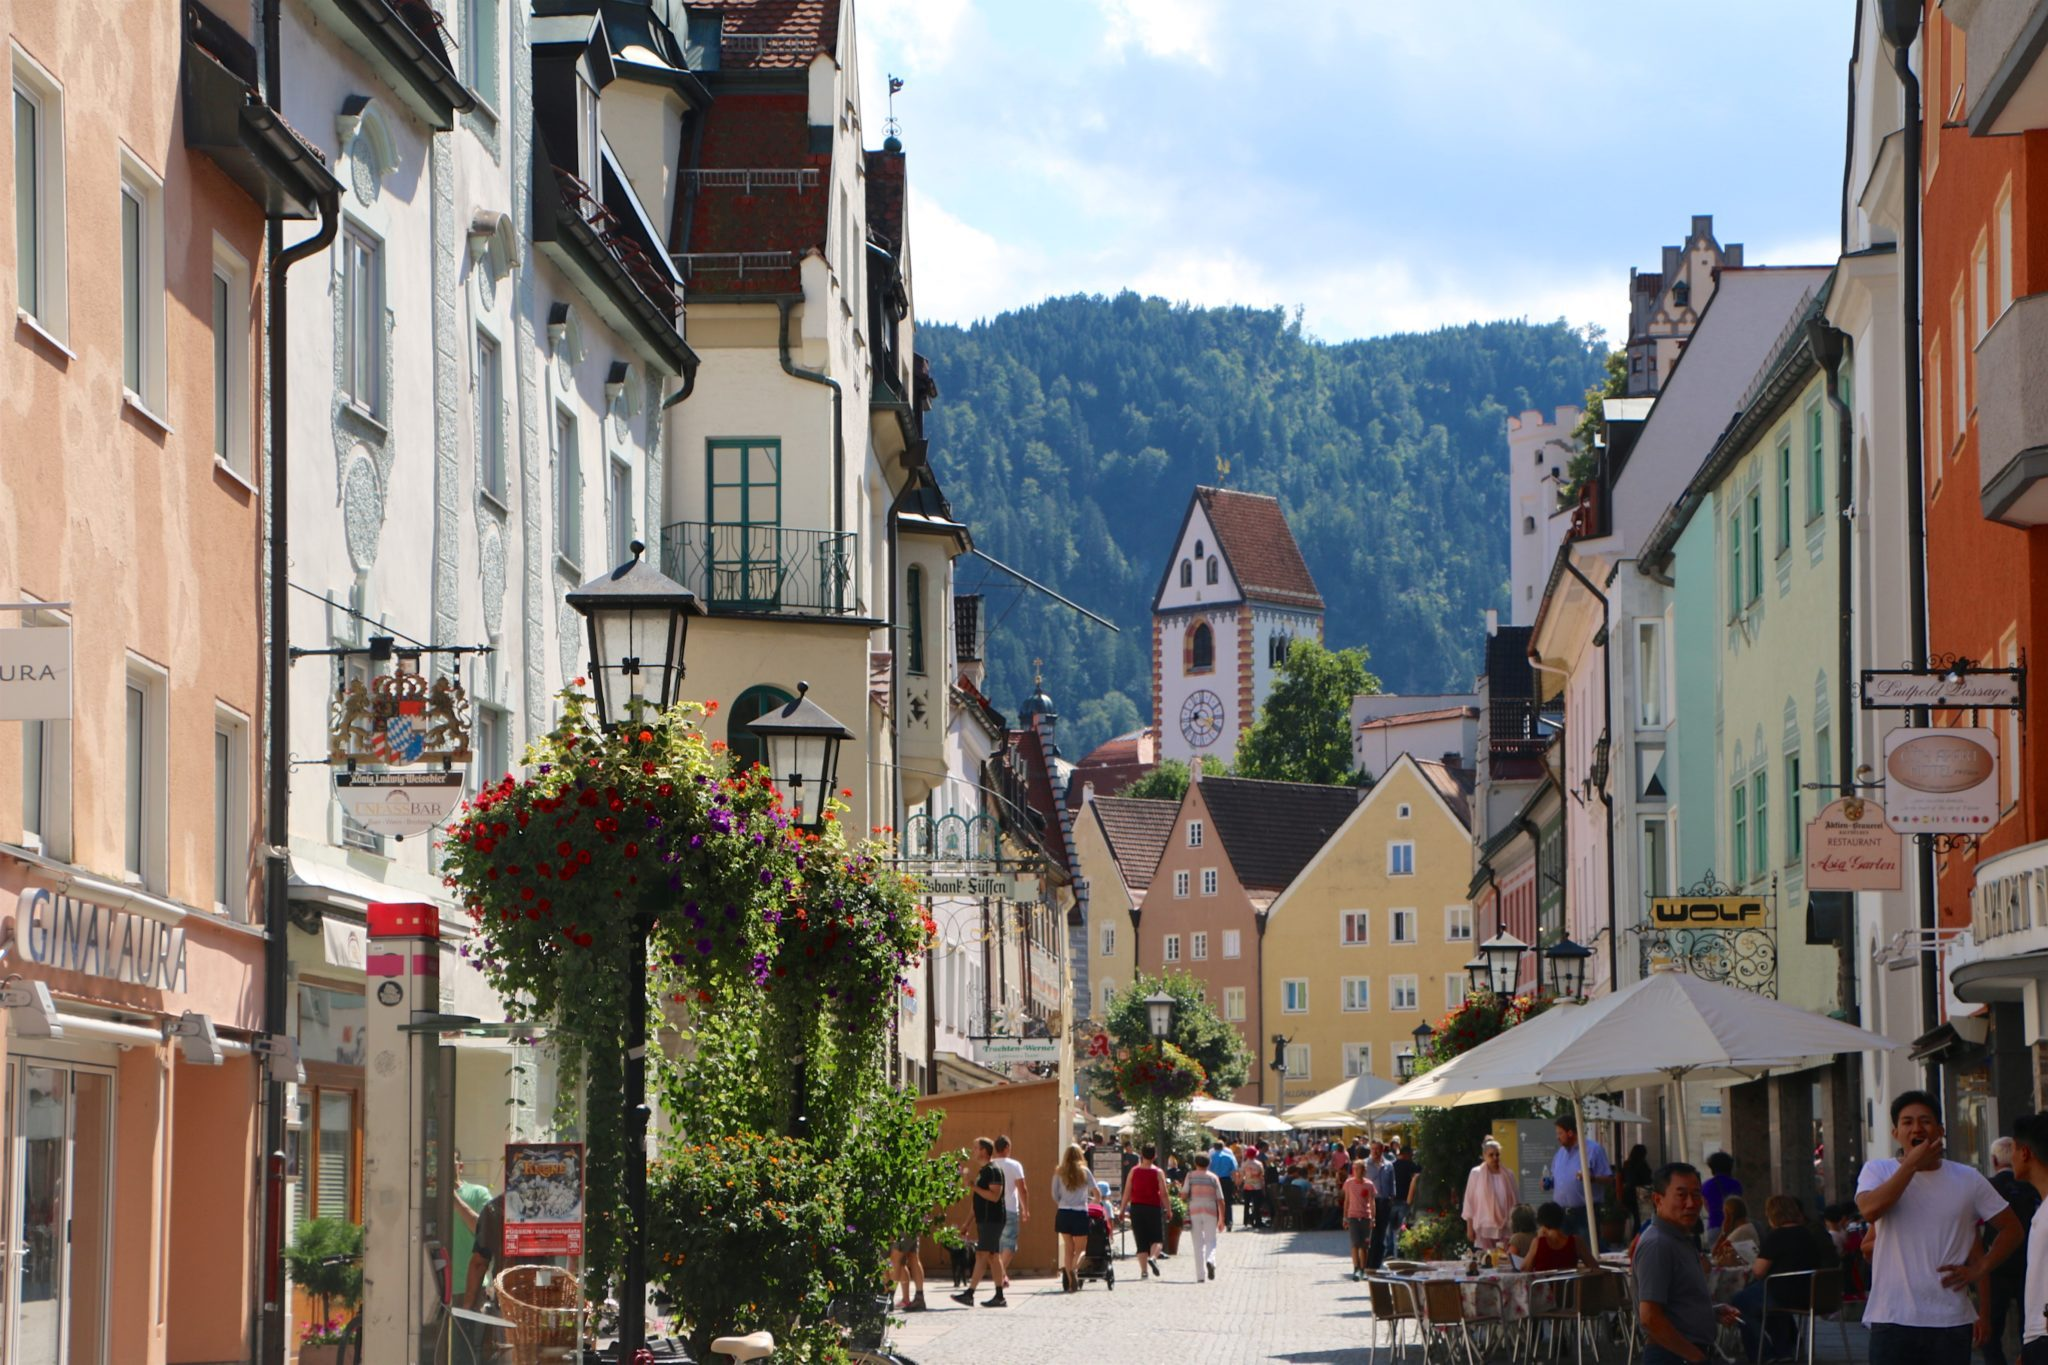 Pleinair destination Fussen, Bavaria